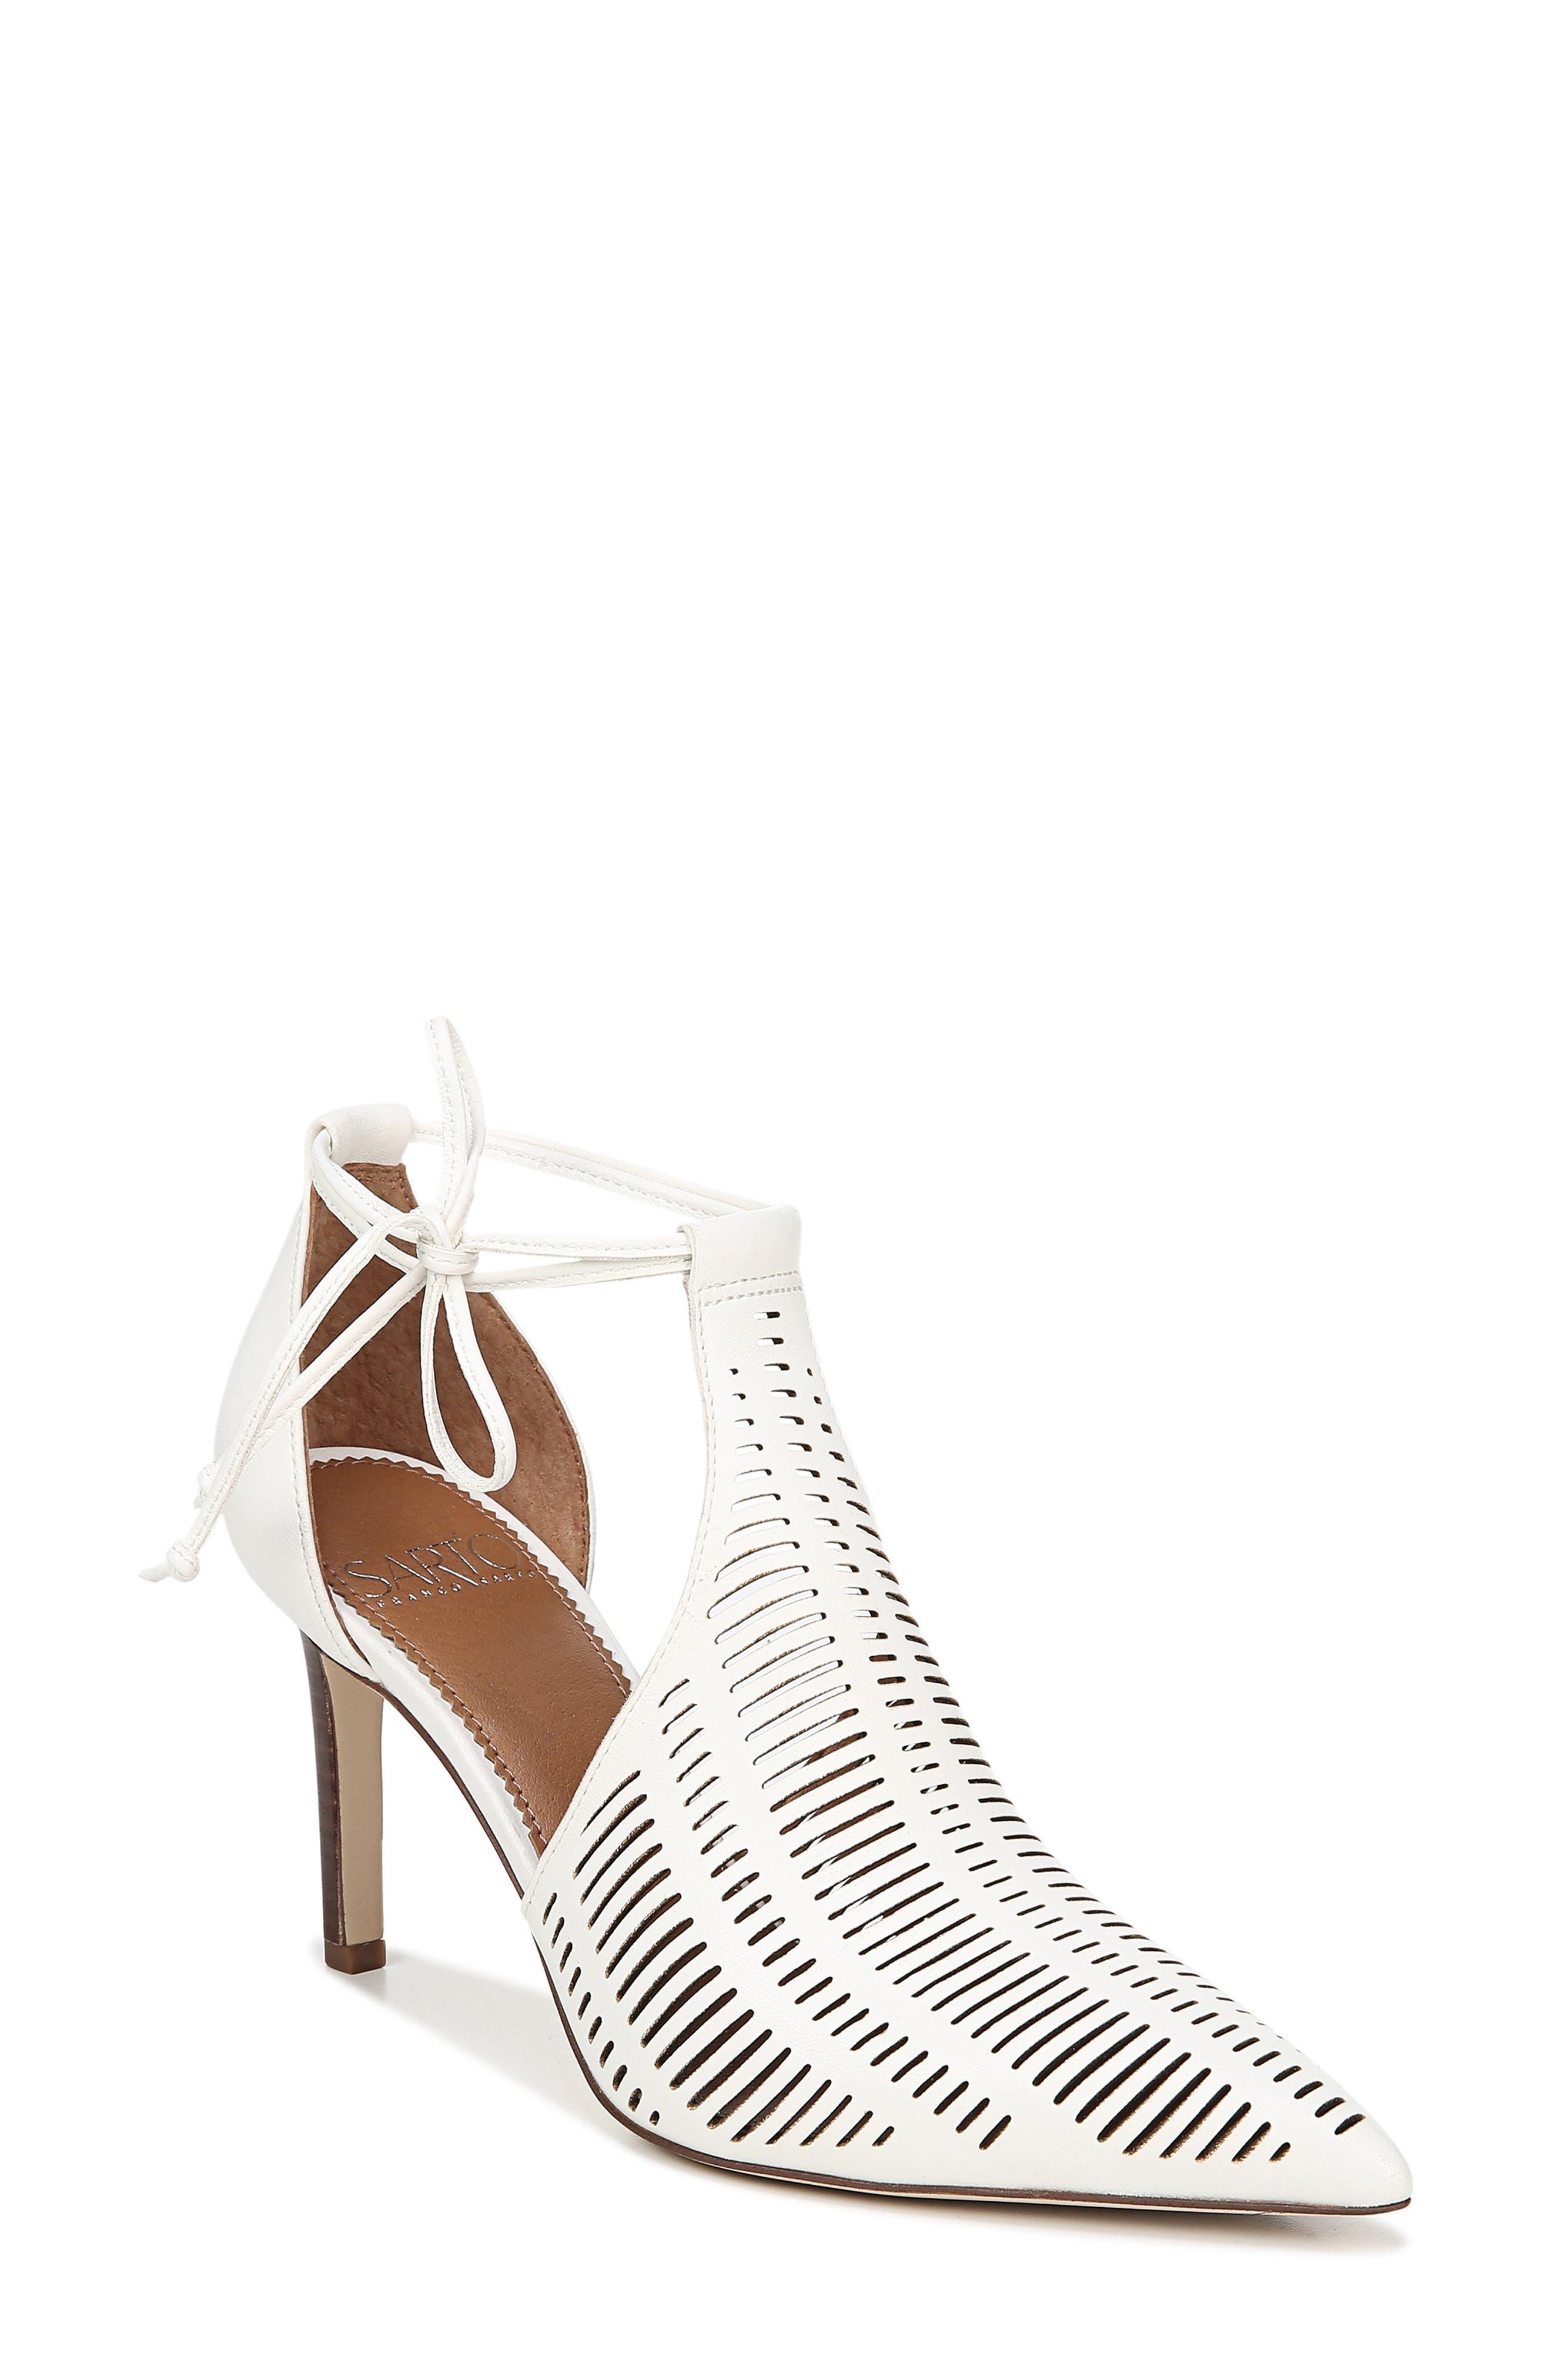 Sarto By Franco Sarto Krista Perforated Ankle Wrap Pump, White